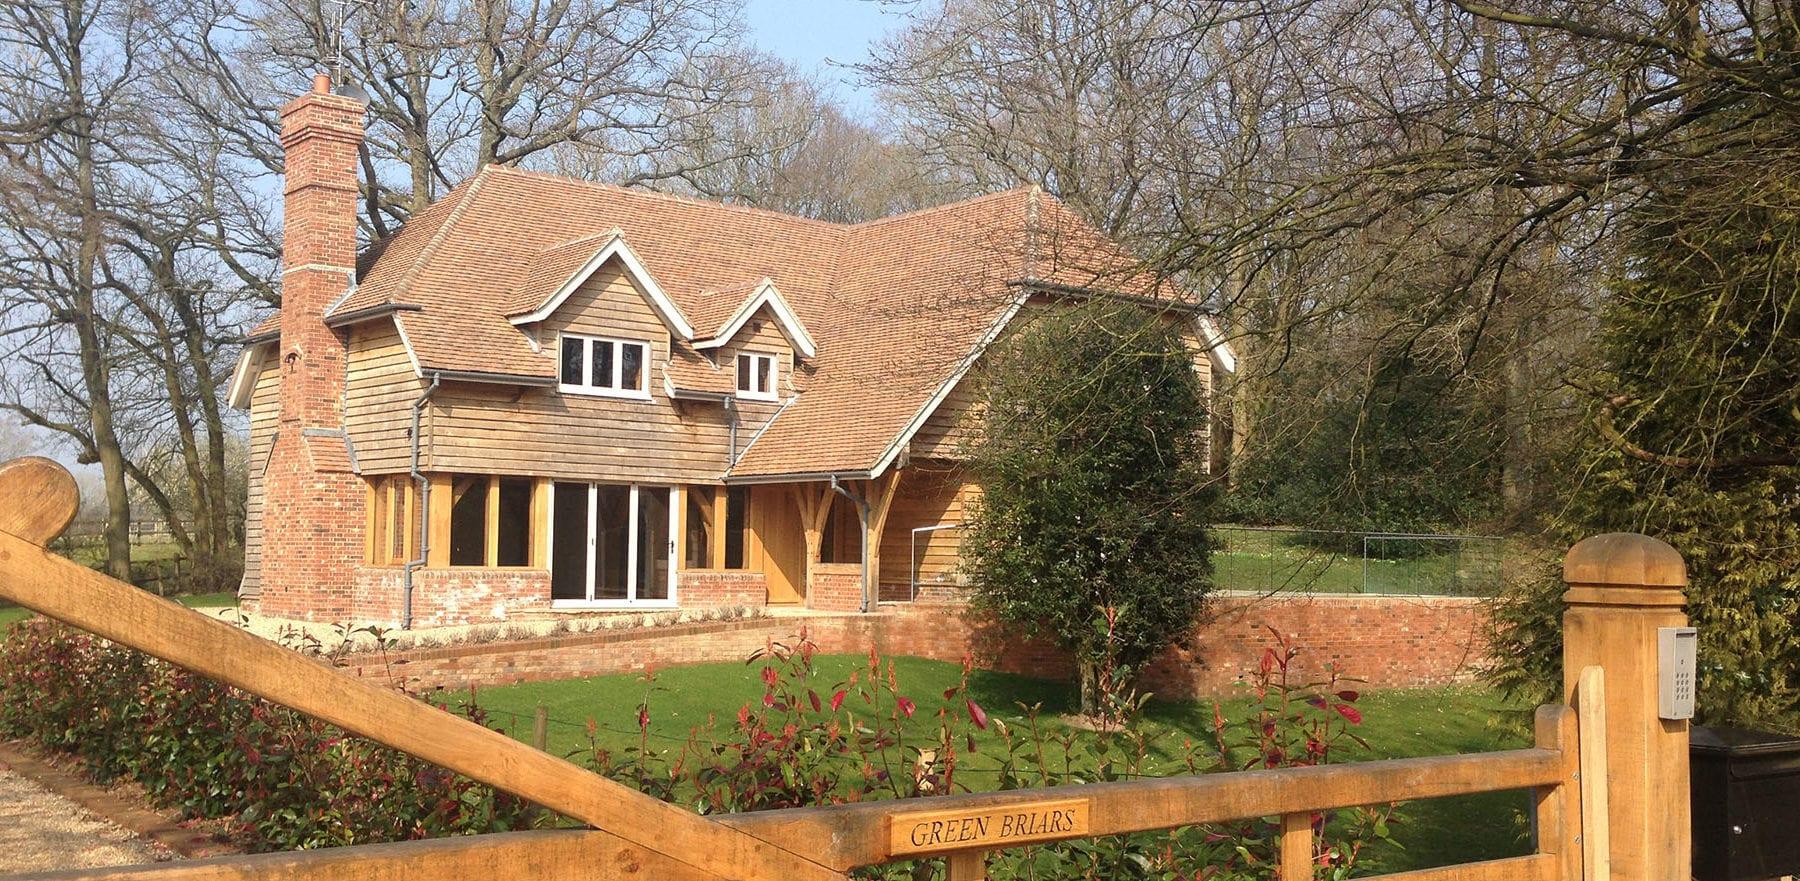 Lifestiles - Handmade Brown Clay Roof Tiles - Cranbrook, England